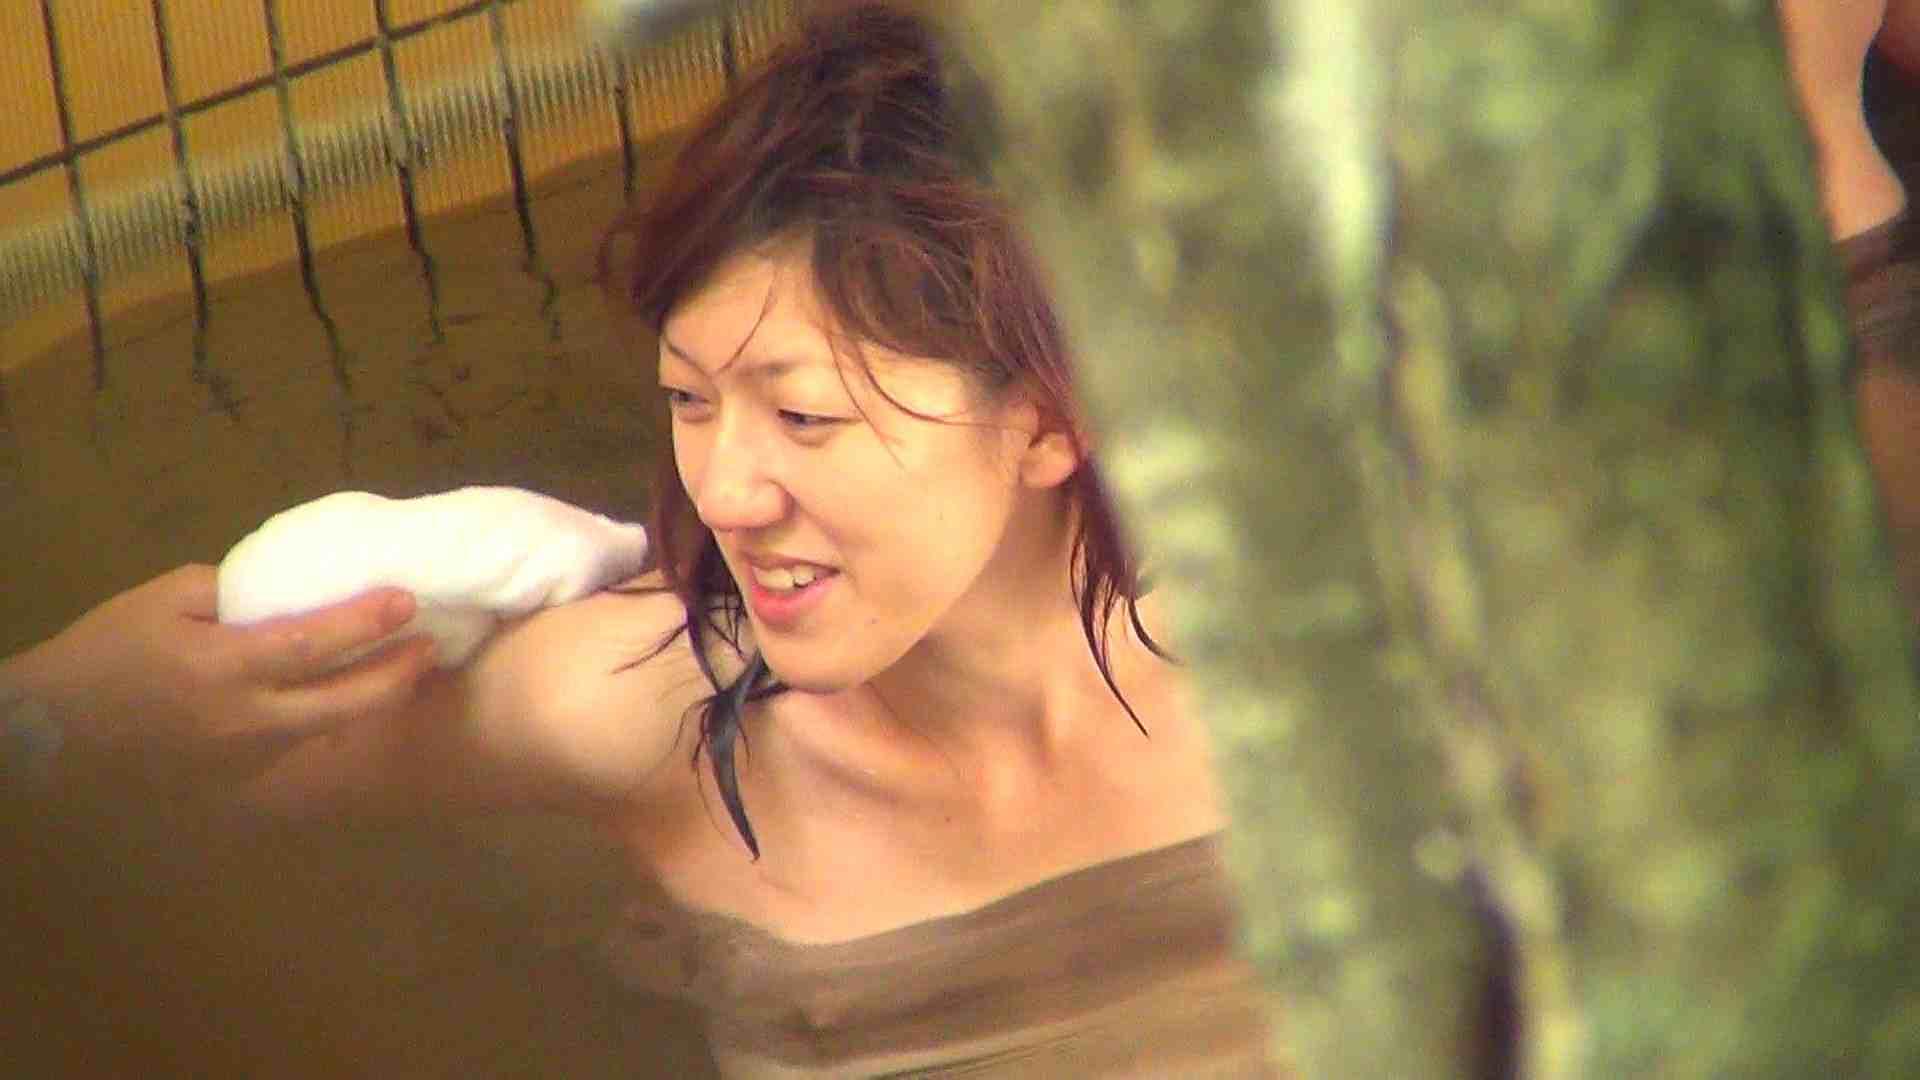 Vol.47 oyakoで登場 スレンダーだけどしっかりしたオッパイ OLの実態 盗撮オマンコ無修正動画無料 24pic 23